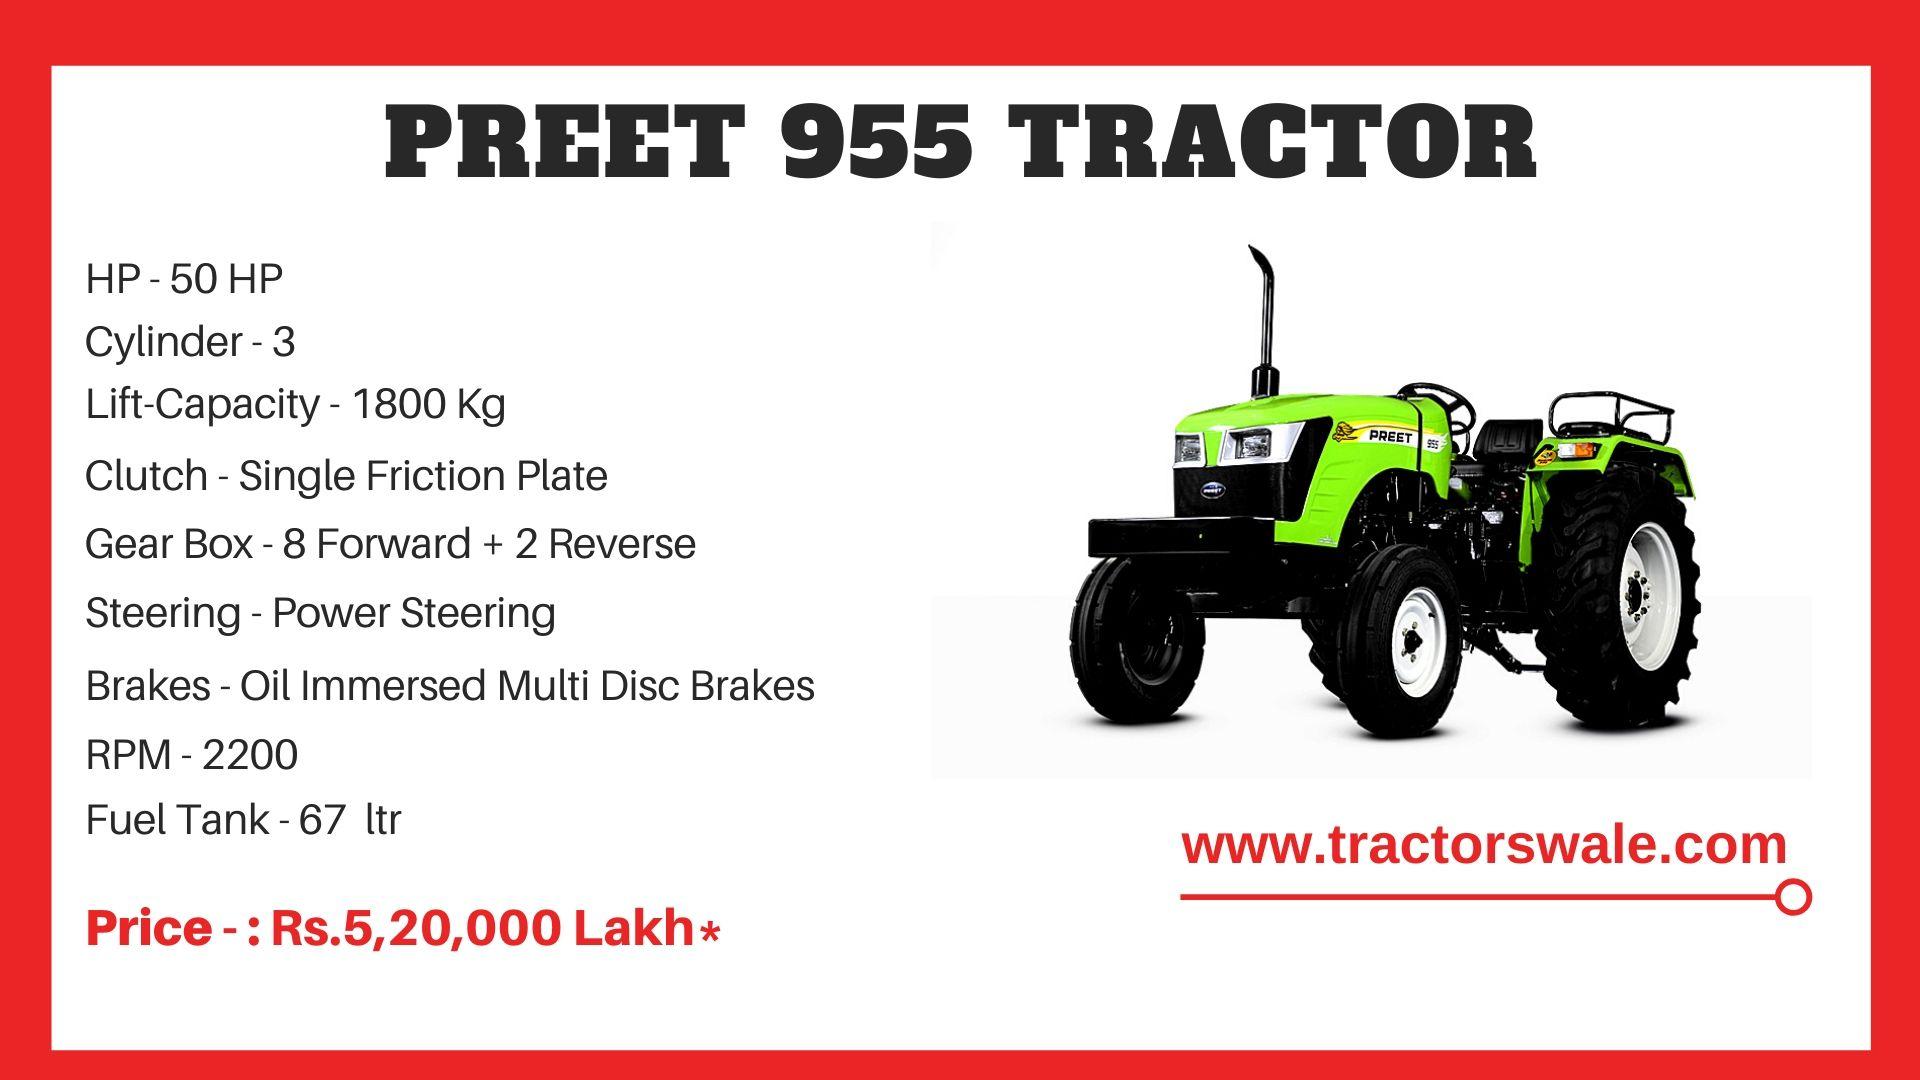 Preet 955 tractor price